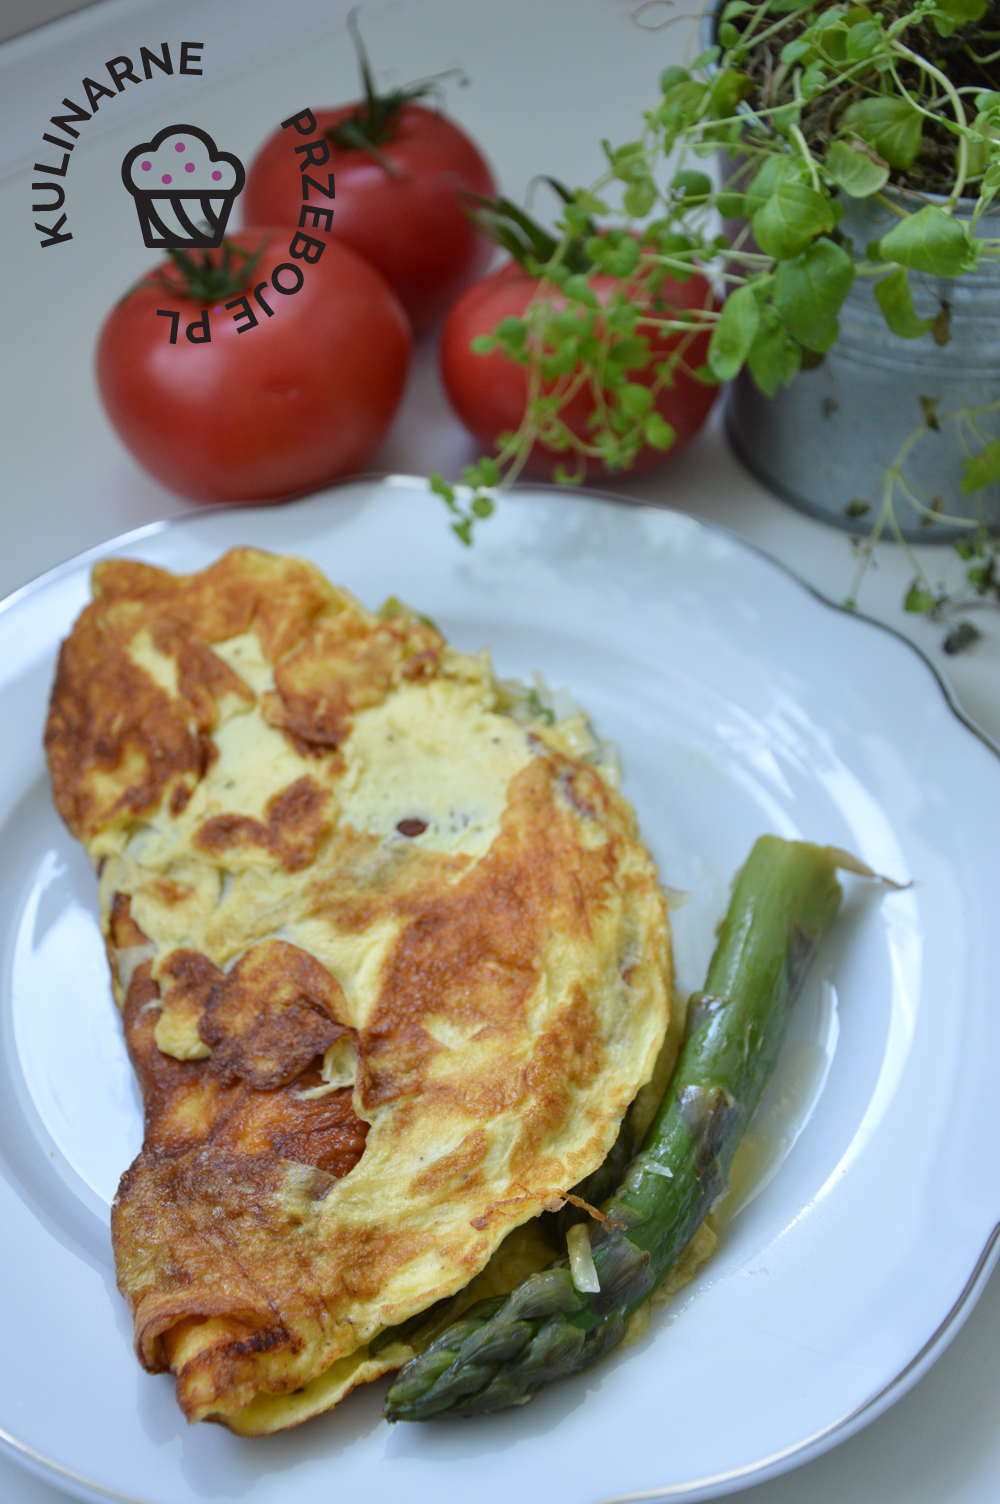 omlet ze szparagami zielonymi